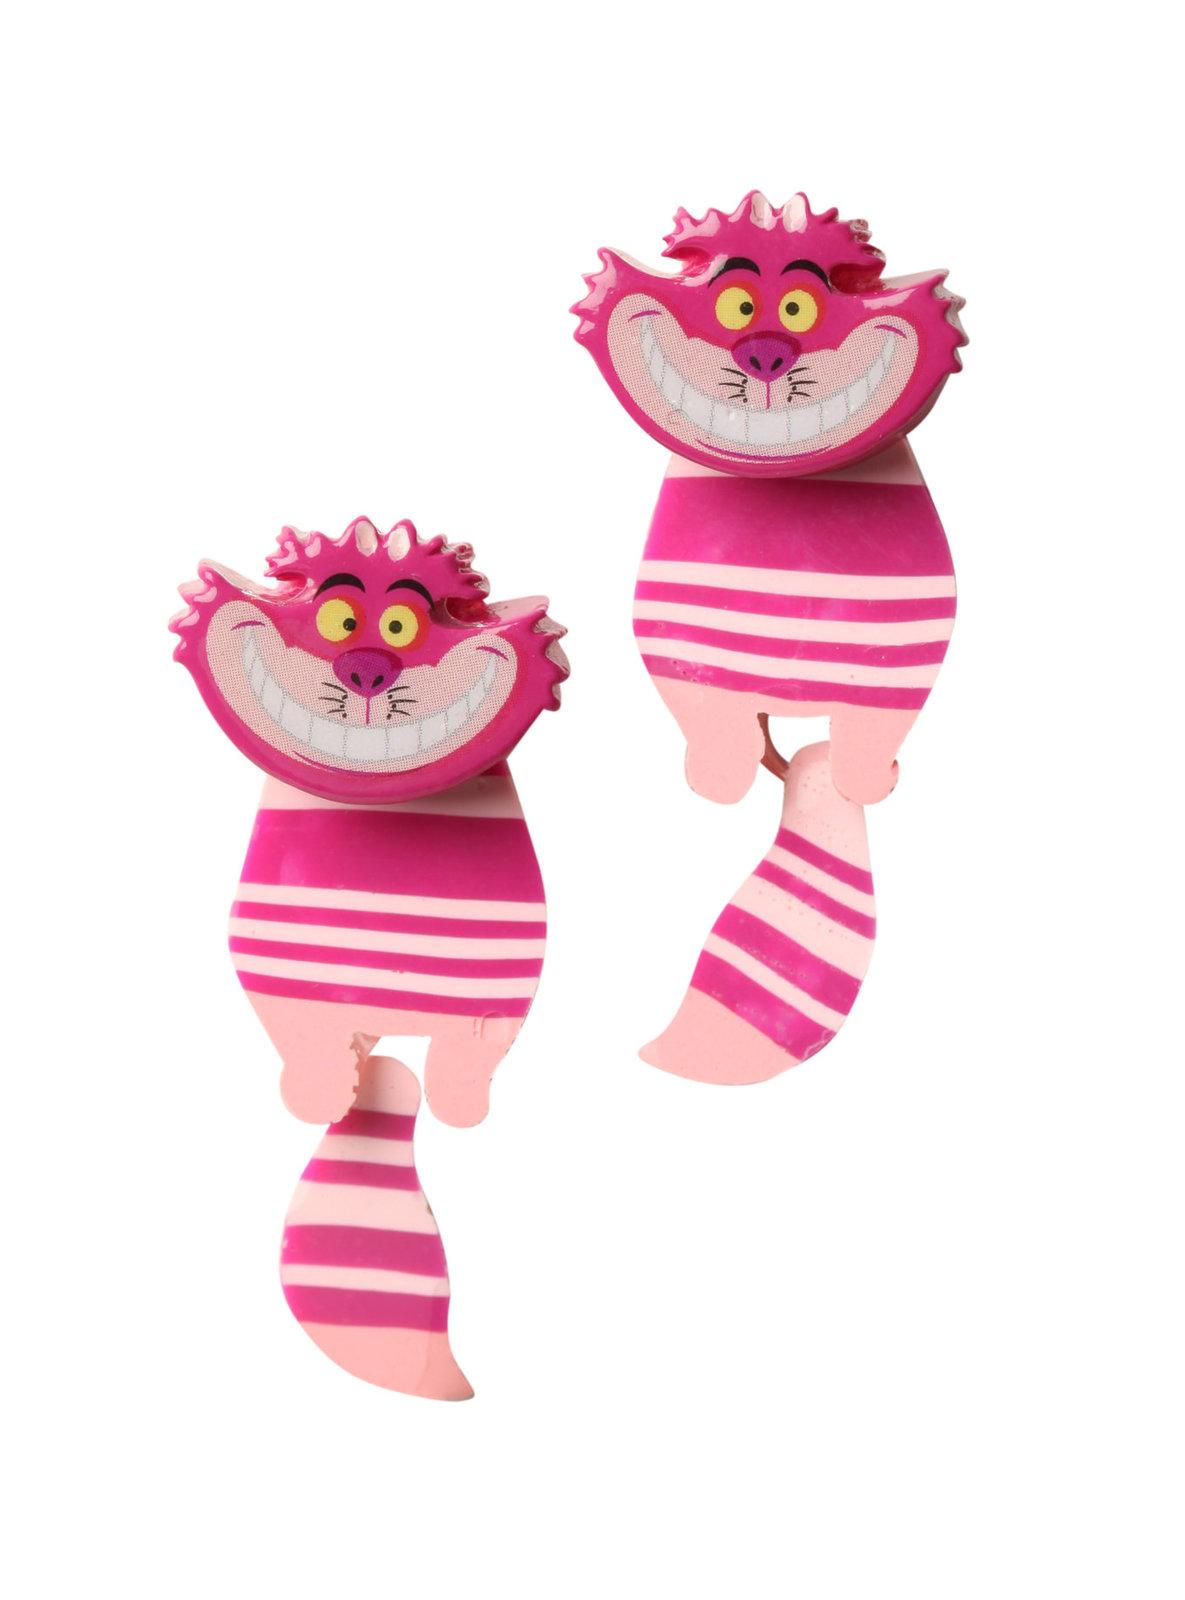 Neon Tuesday: Alice In Wonderland - Cheshire Cat Swivel Earrings image